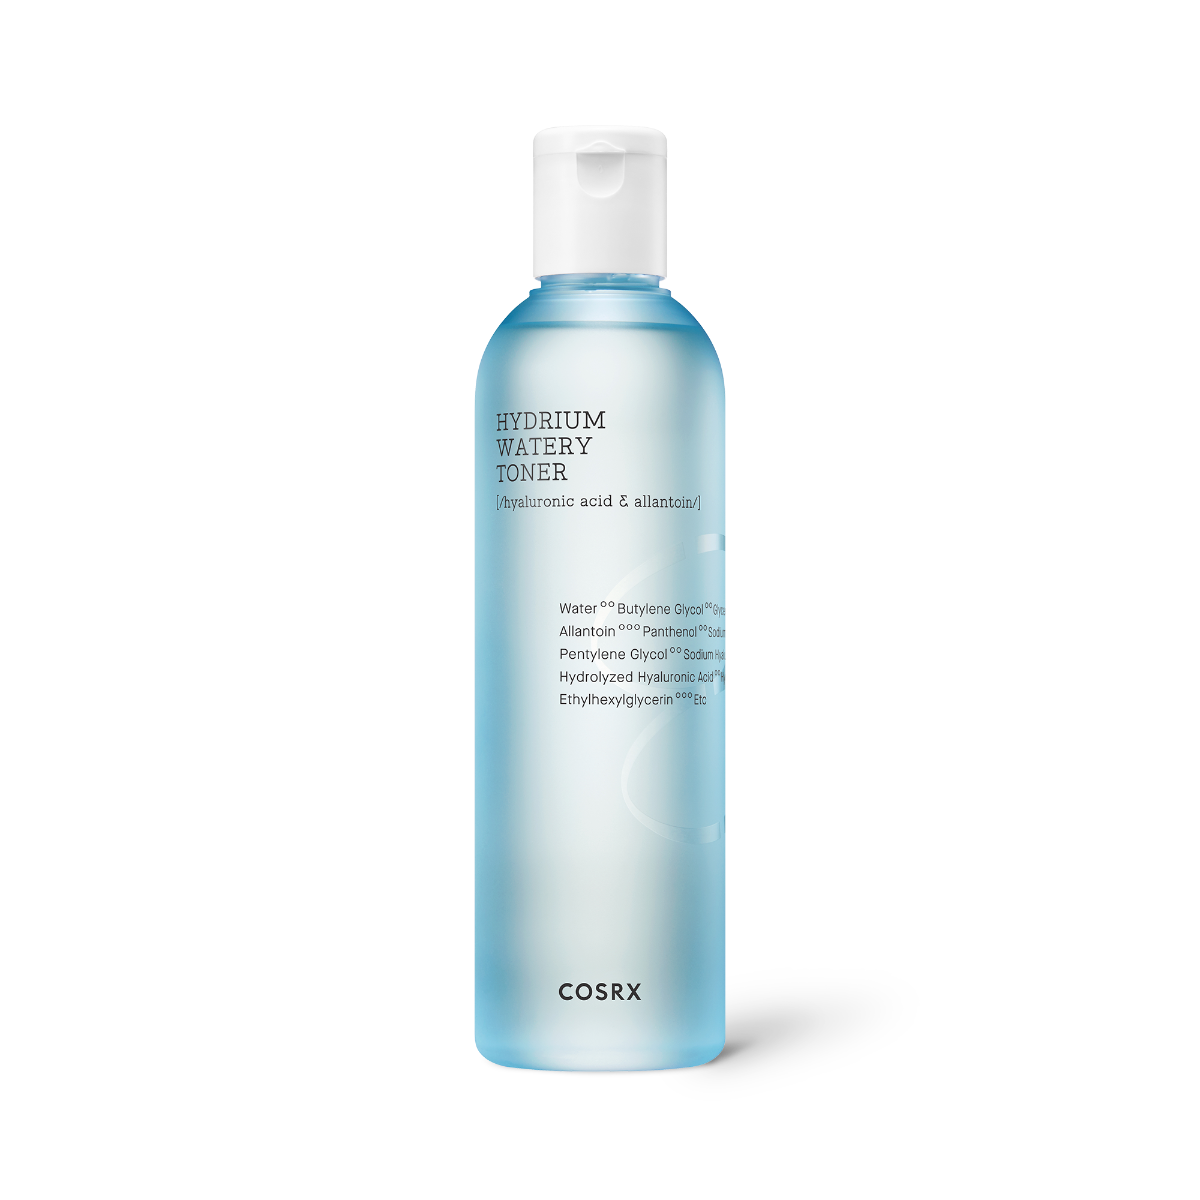 COSRX - Hydrium Watery Toner 1